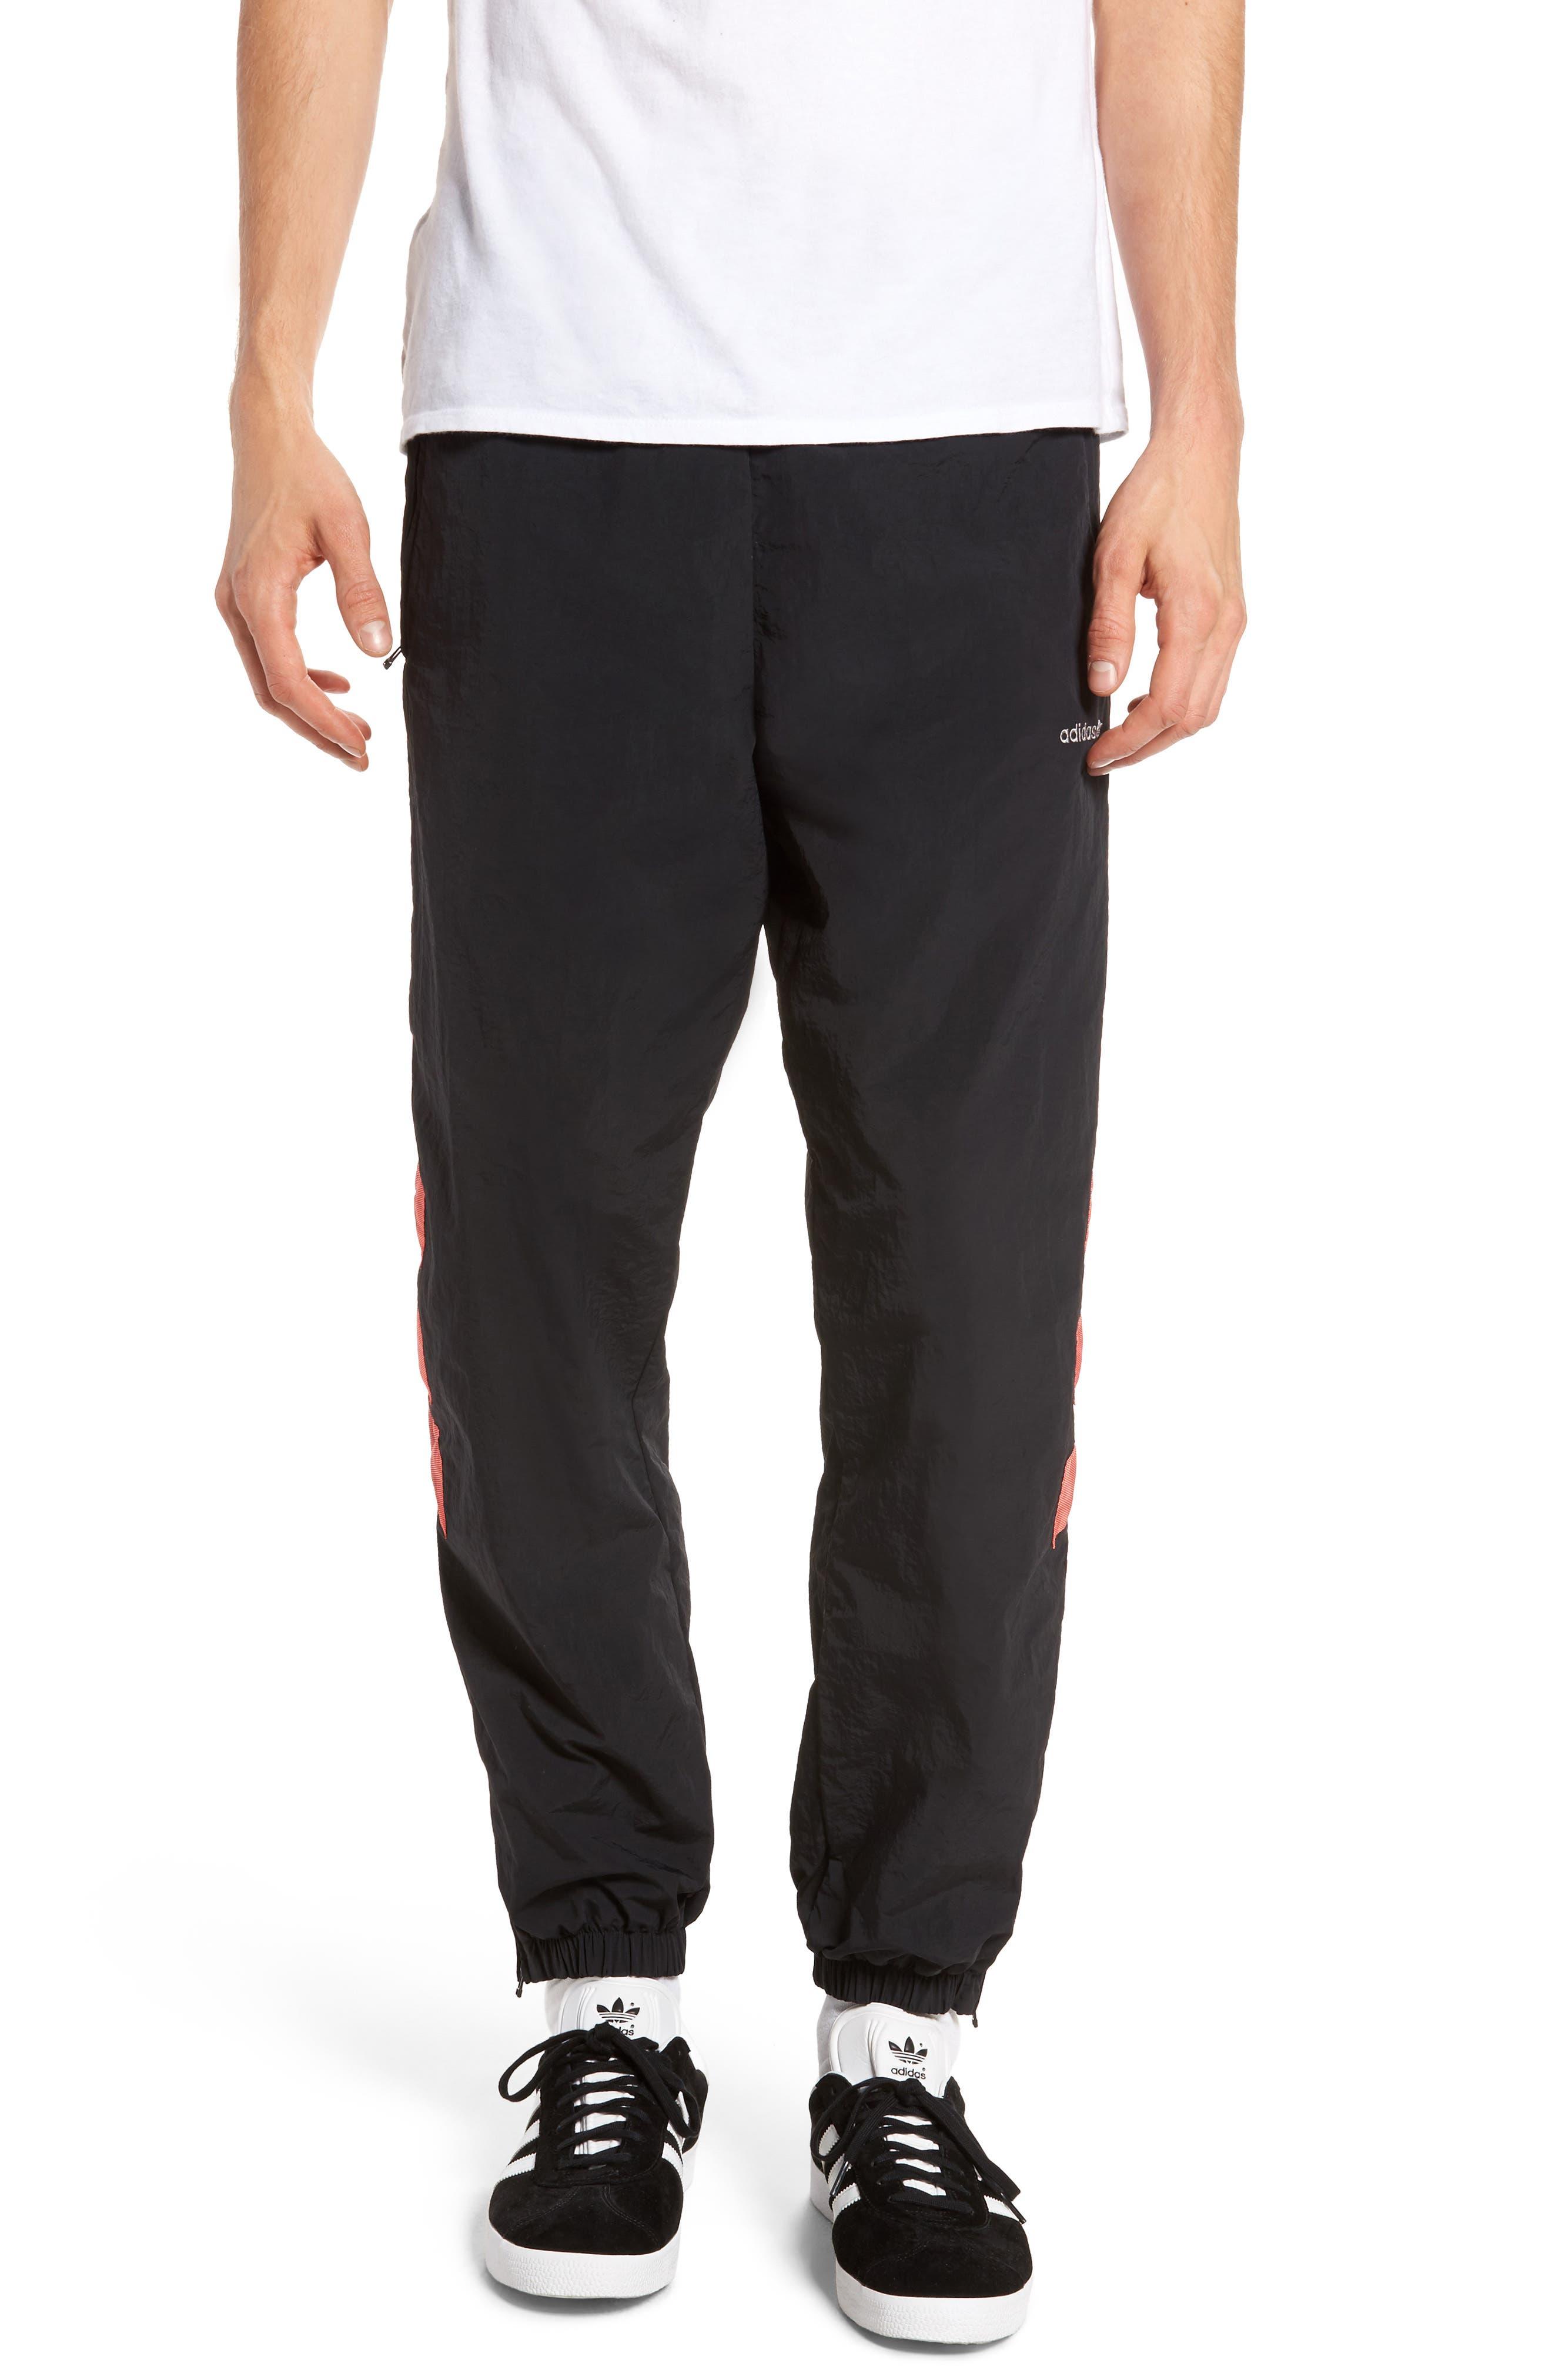 Originals Tironti Windpants,                         Main,                         color, 001